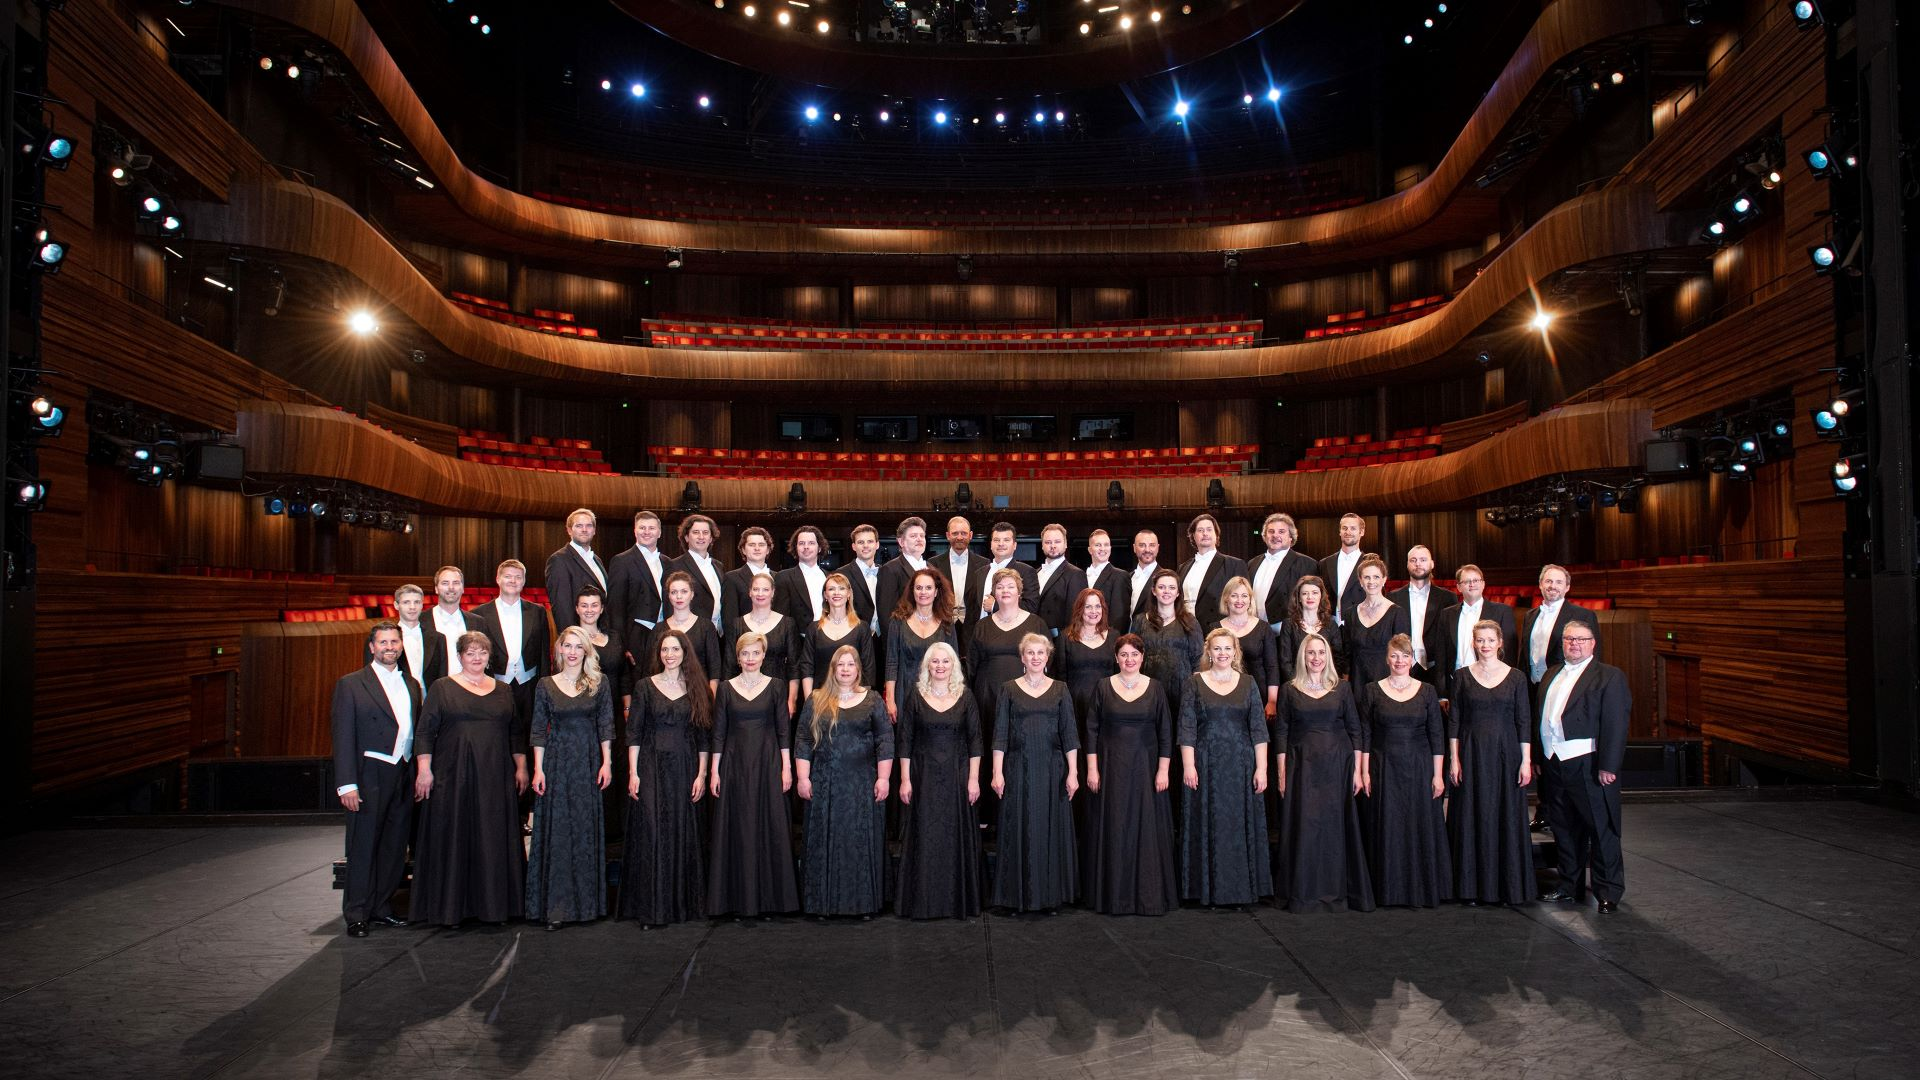 The Opera Chorus Summer Concert